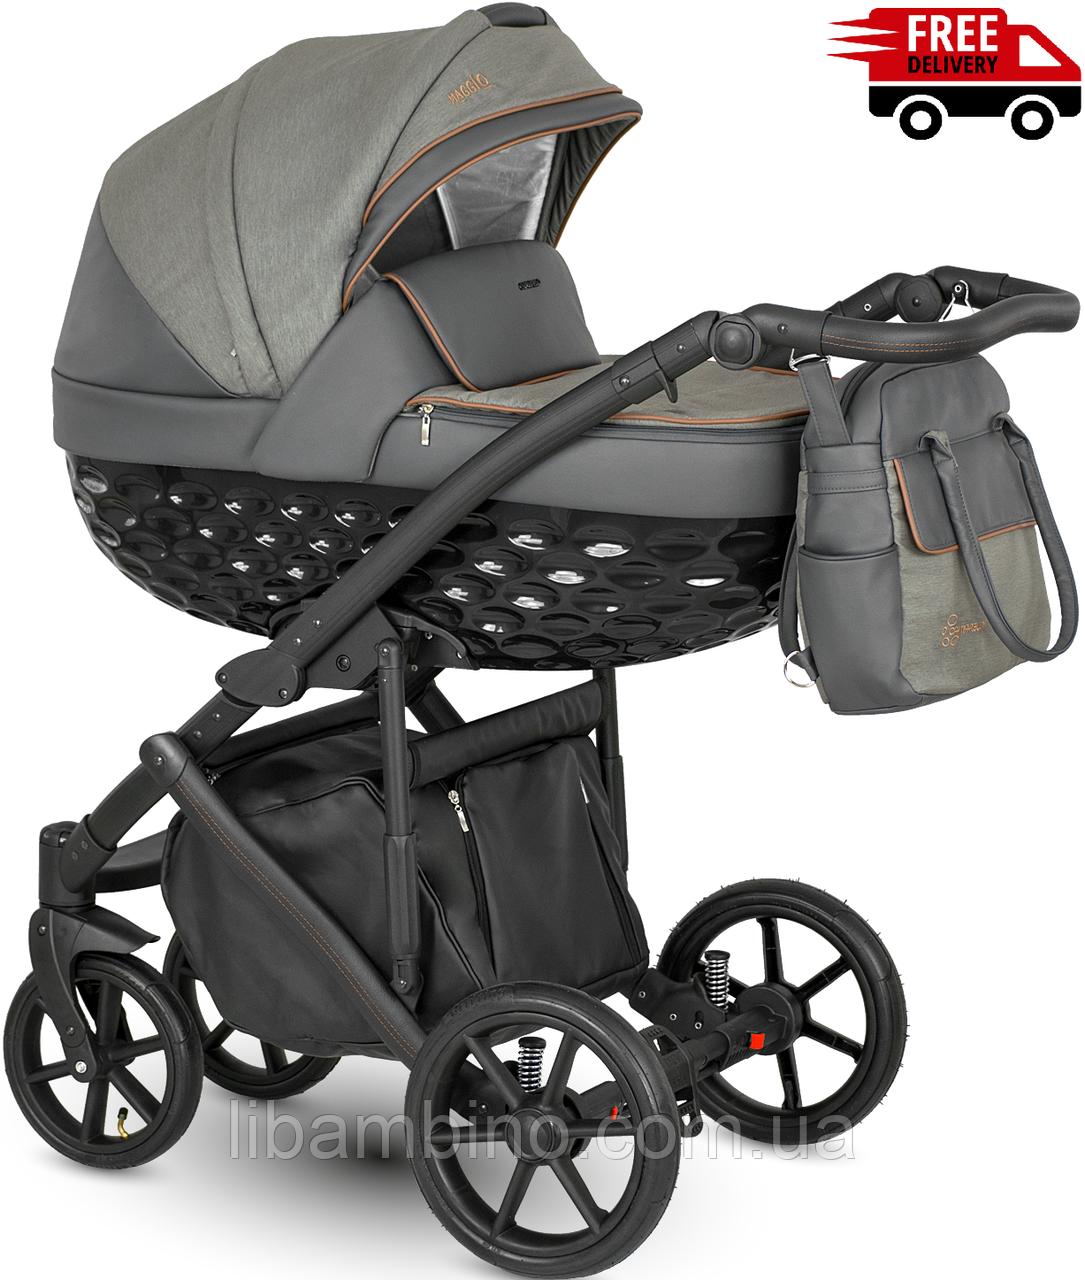 Дитяча універсальна коляска 2 в 1 Camarelo Maggio Mg-02